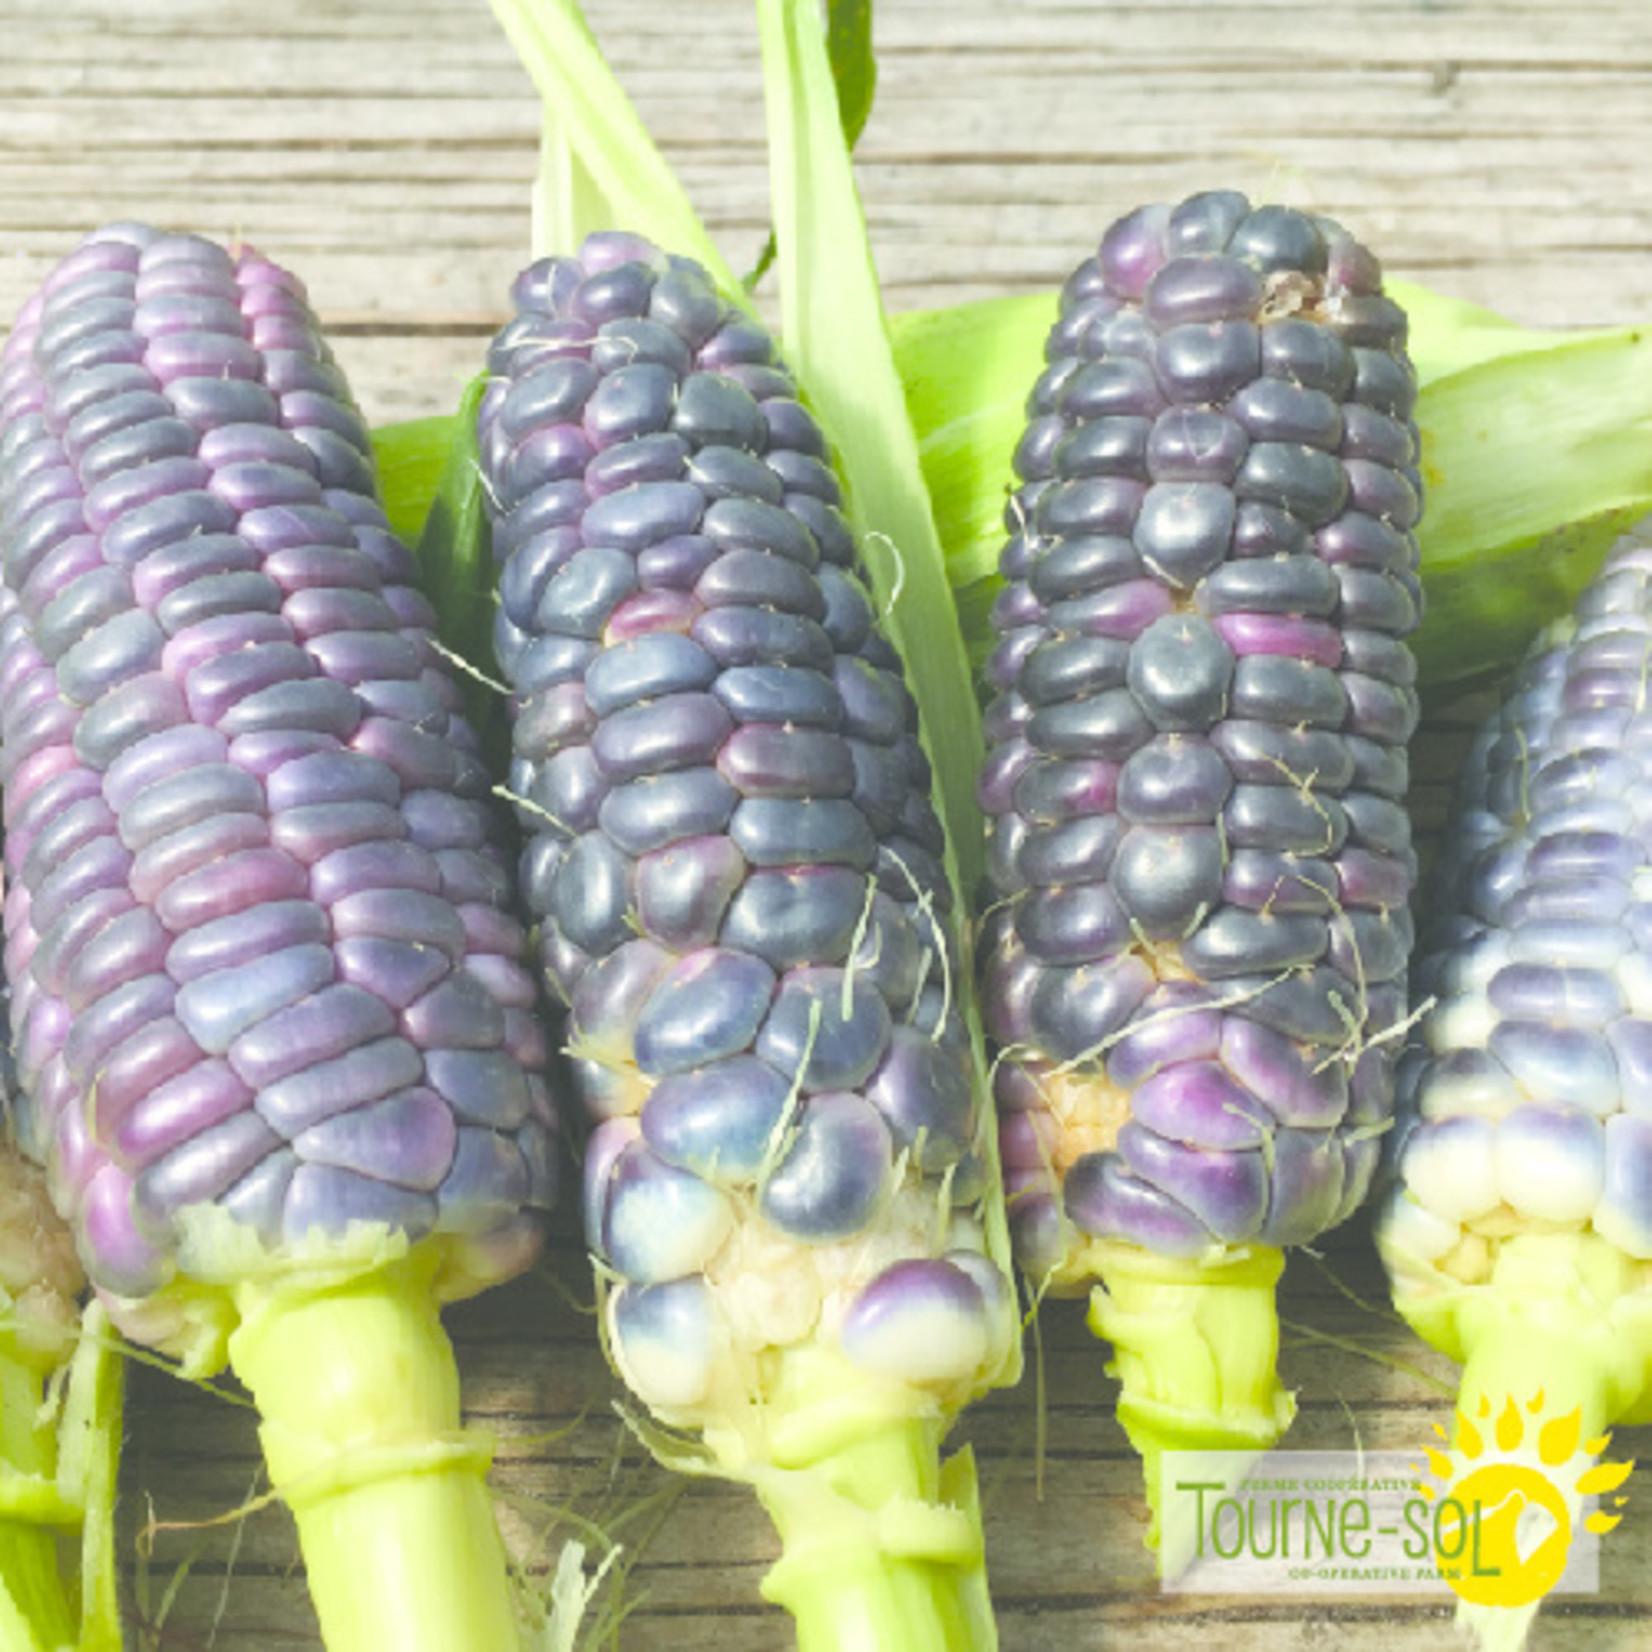 Tourne-Sol  Amish rainbow broomcorn